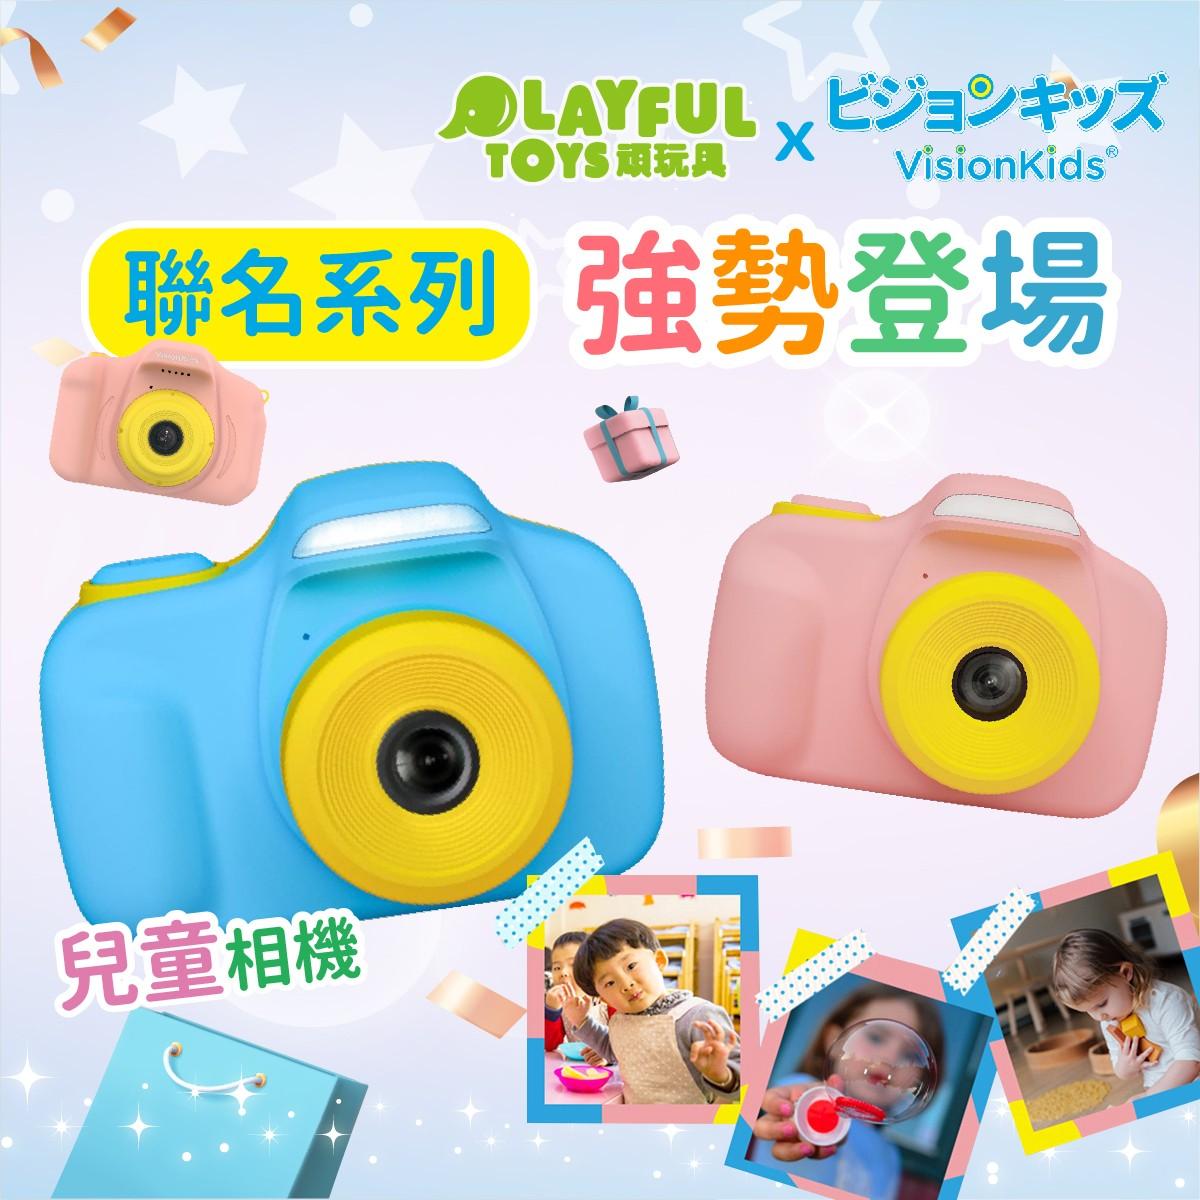 PlayfulToys頑玩具首度合作商品! 日本知名品牌VisionKids兒童相機強勢登場!前後雙鏡頭多款濾鏡,可愛爆棚造型,讓小孩都愛瘋了,兒童玩具熱賣好評!